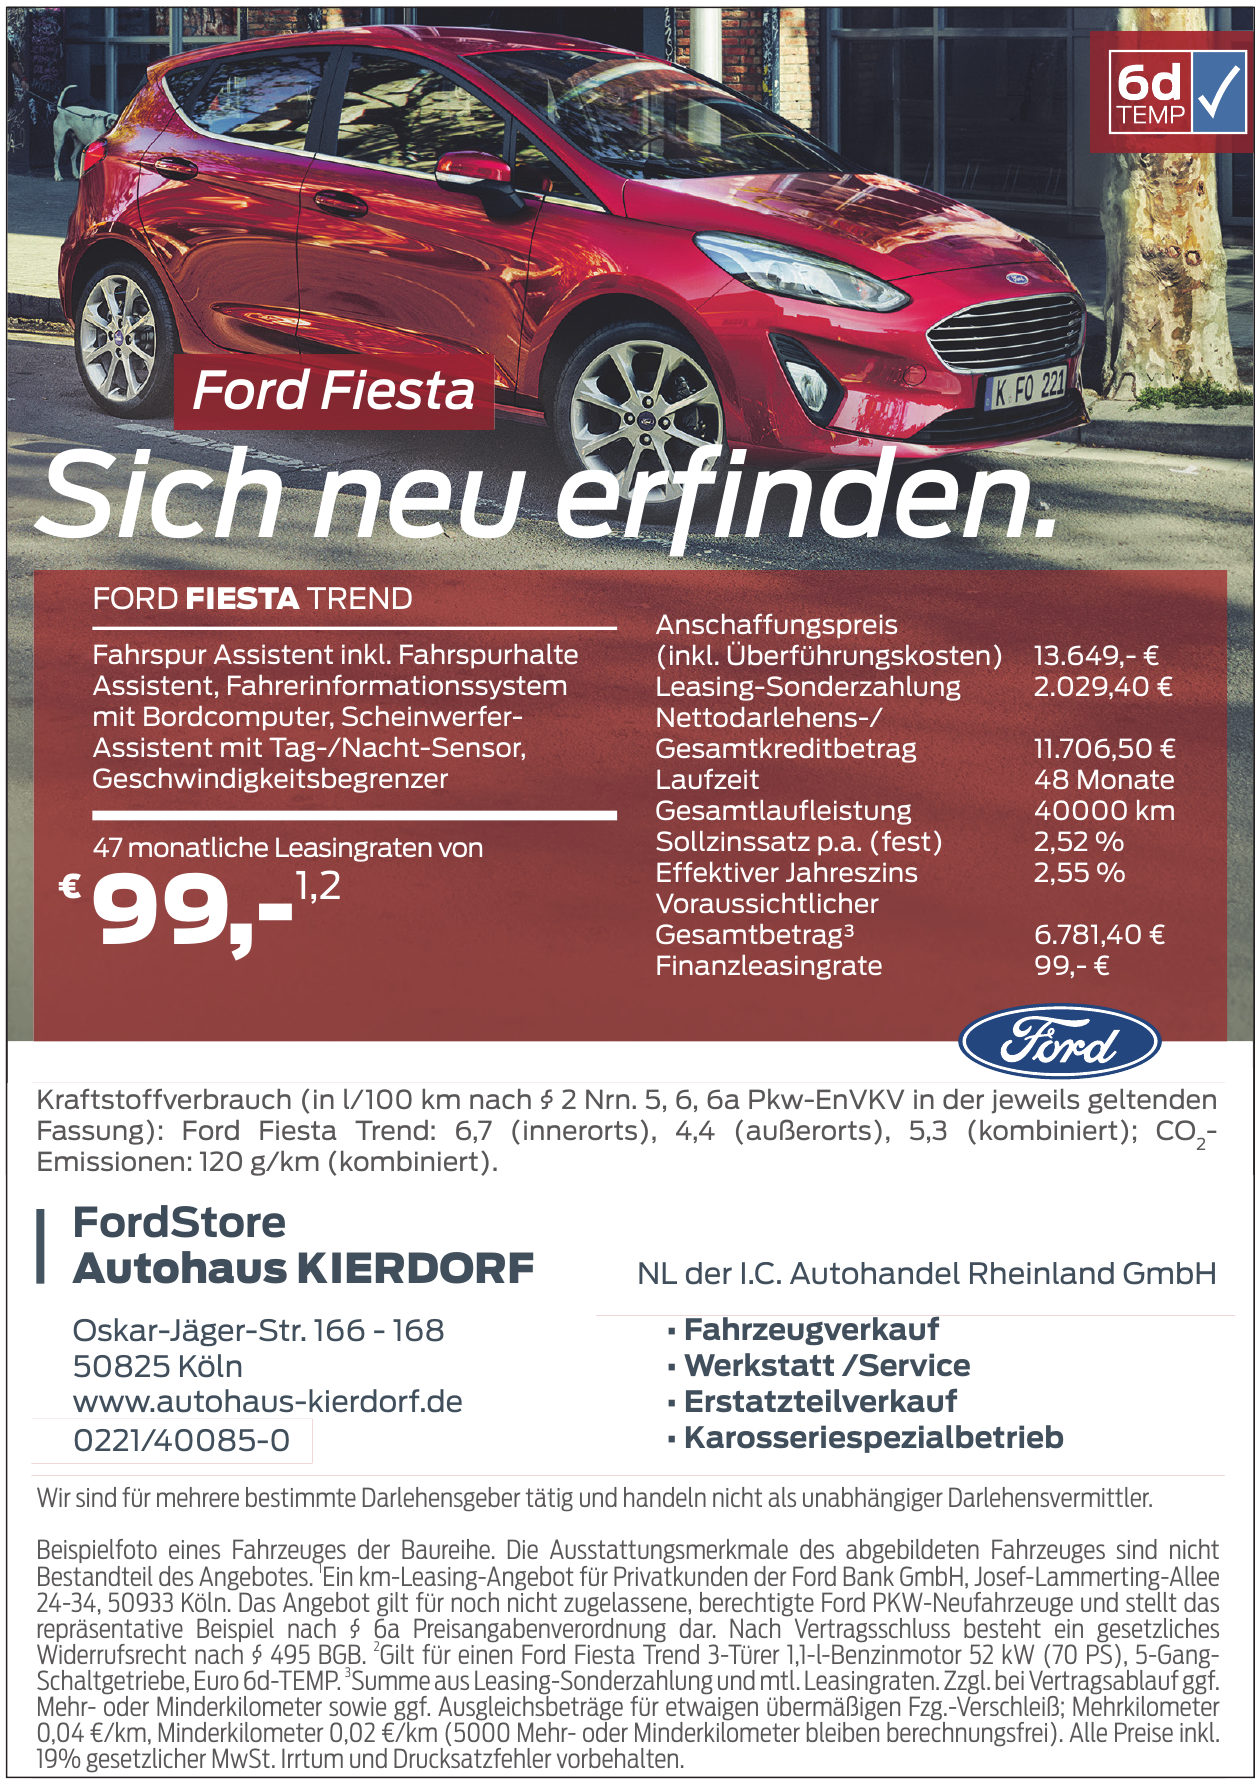 Autohaus Kierdorf